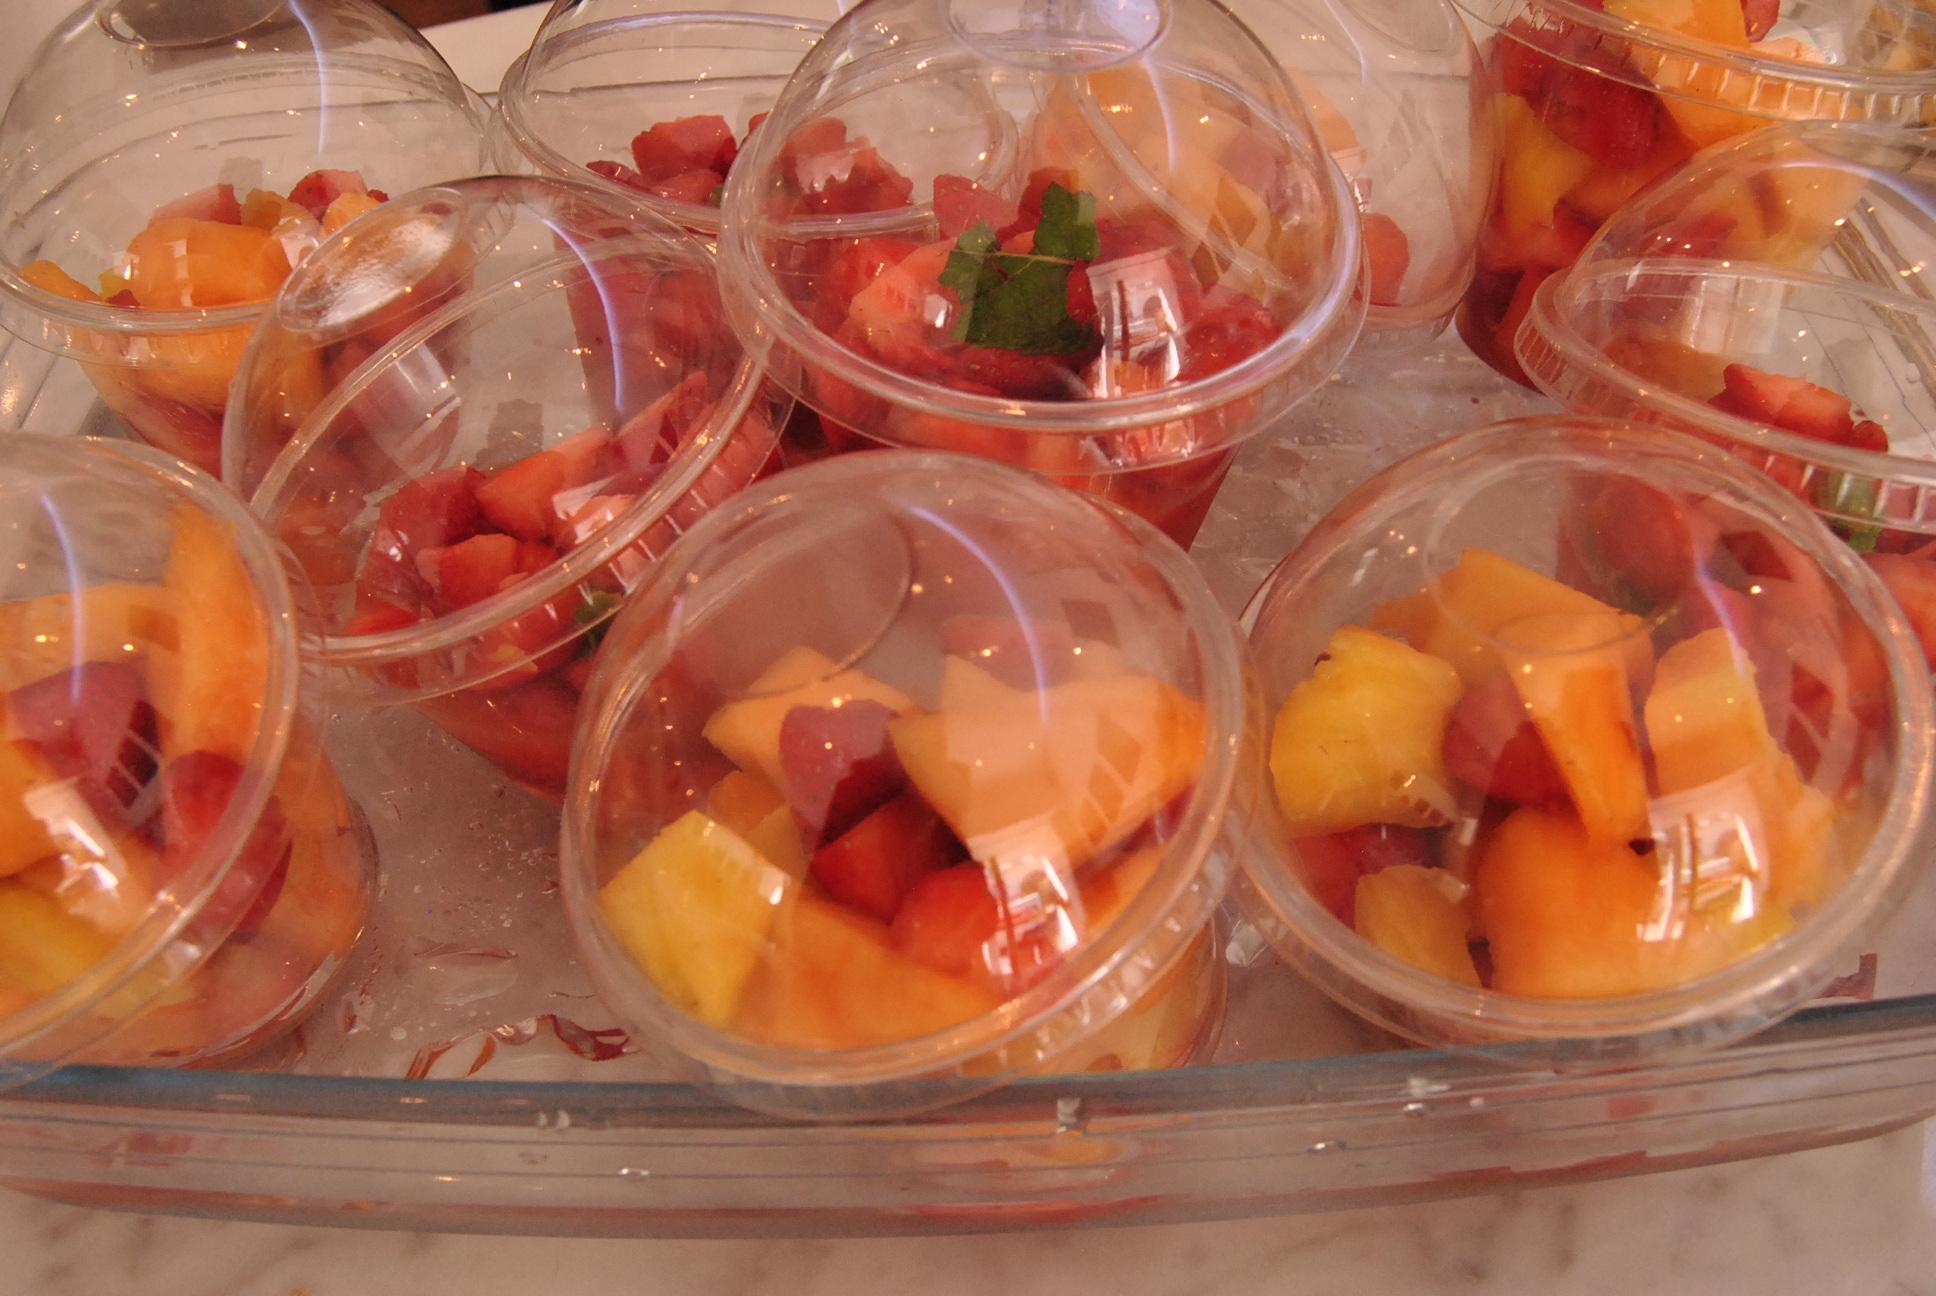 fresh fruits in paris